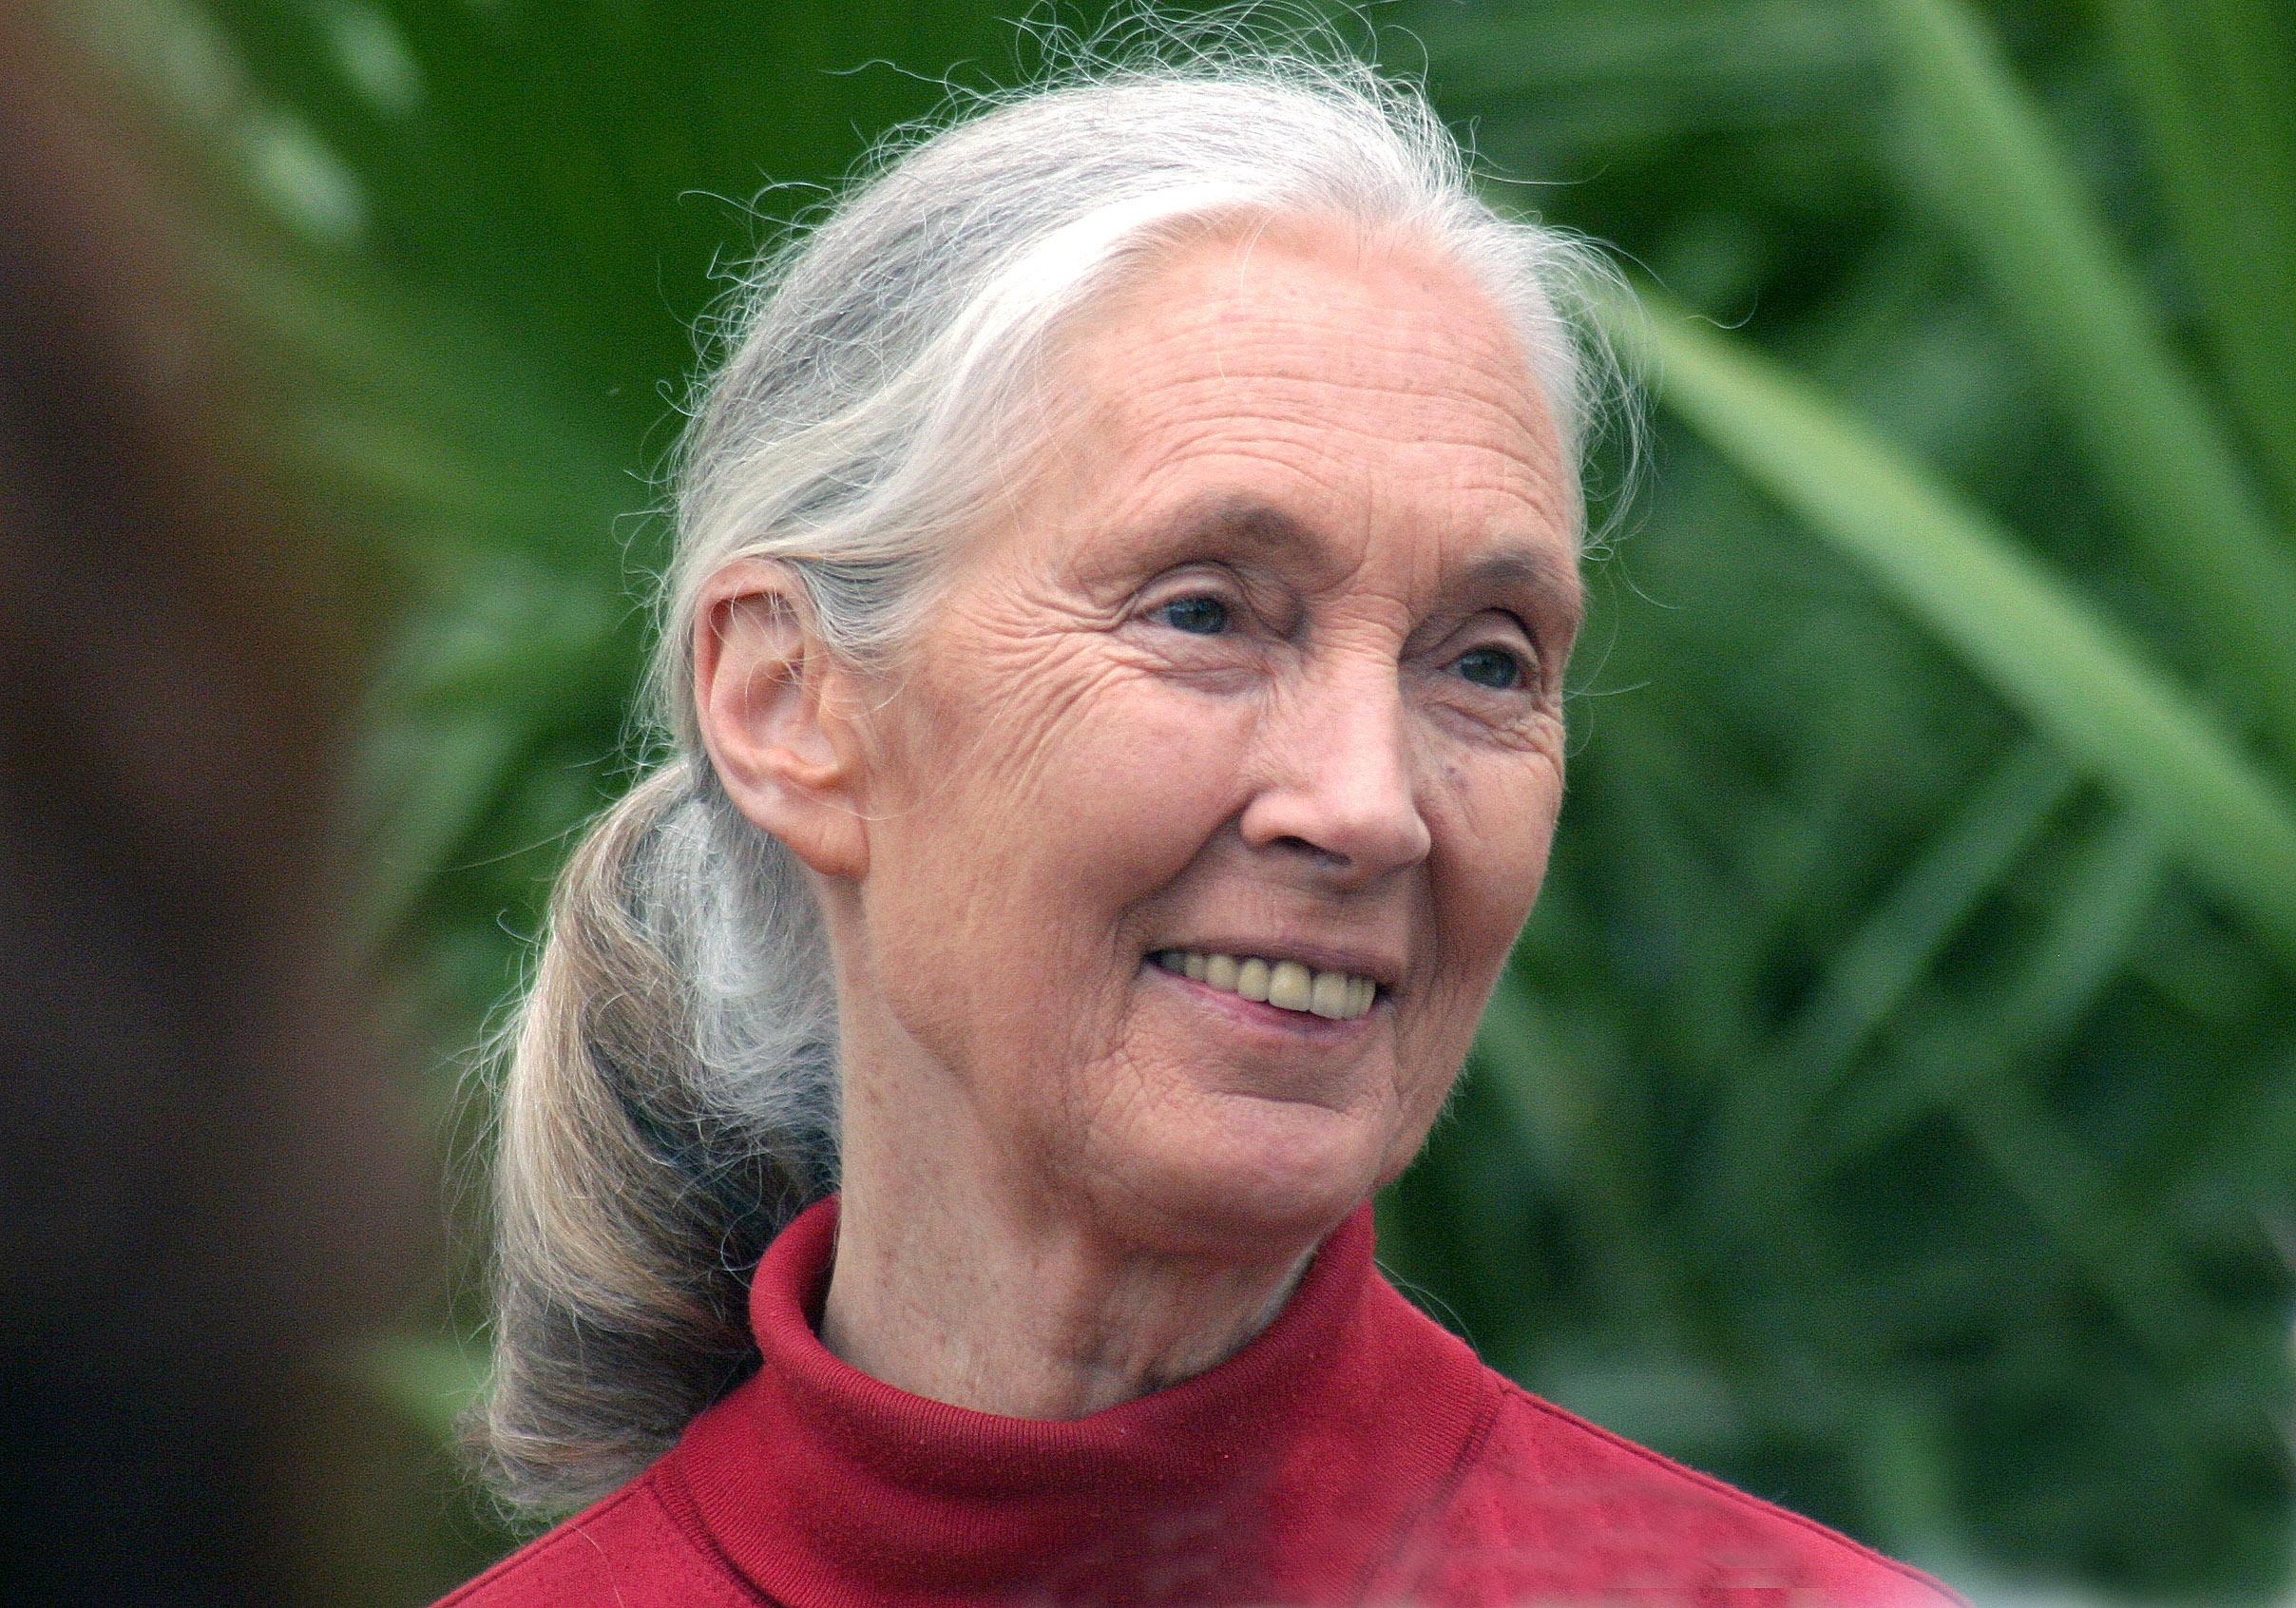 Public lecture by Jane Goodall - WUR Chimpanzee Jane